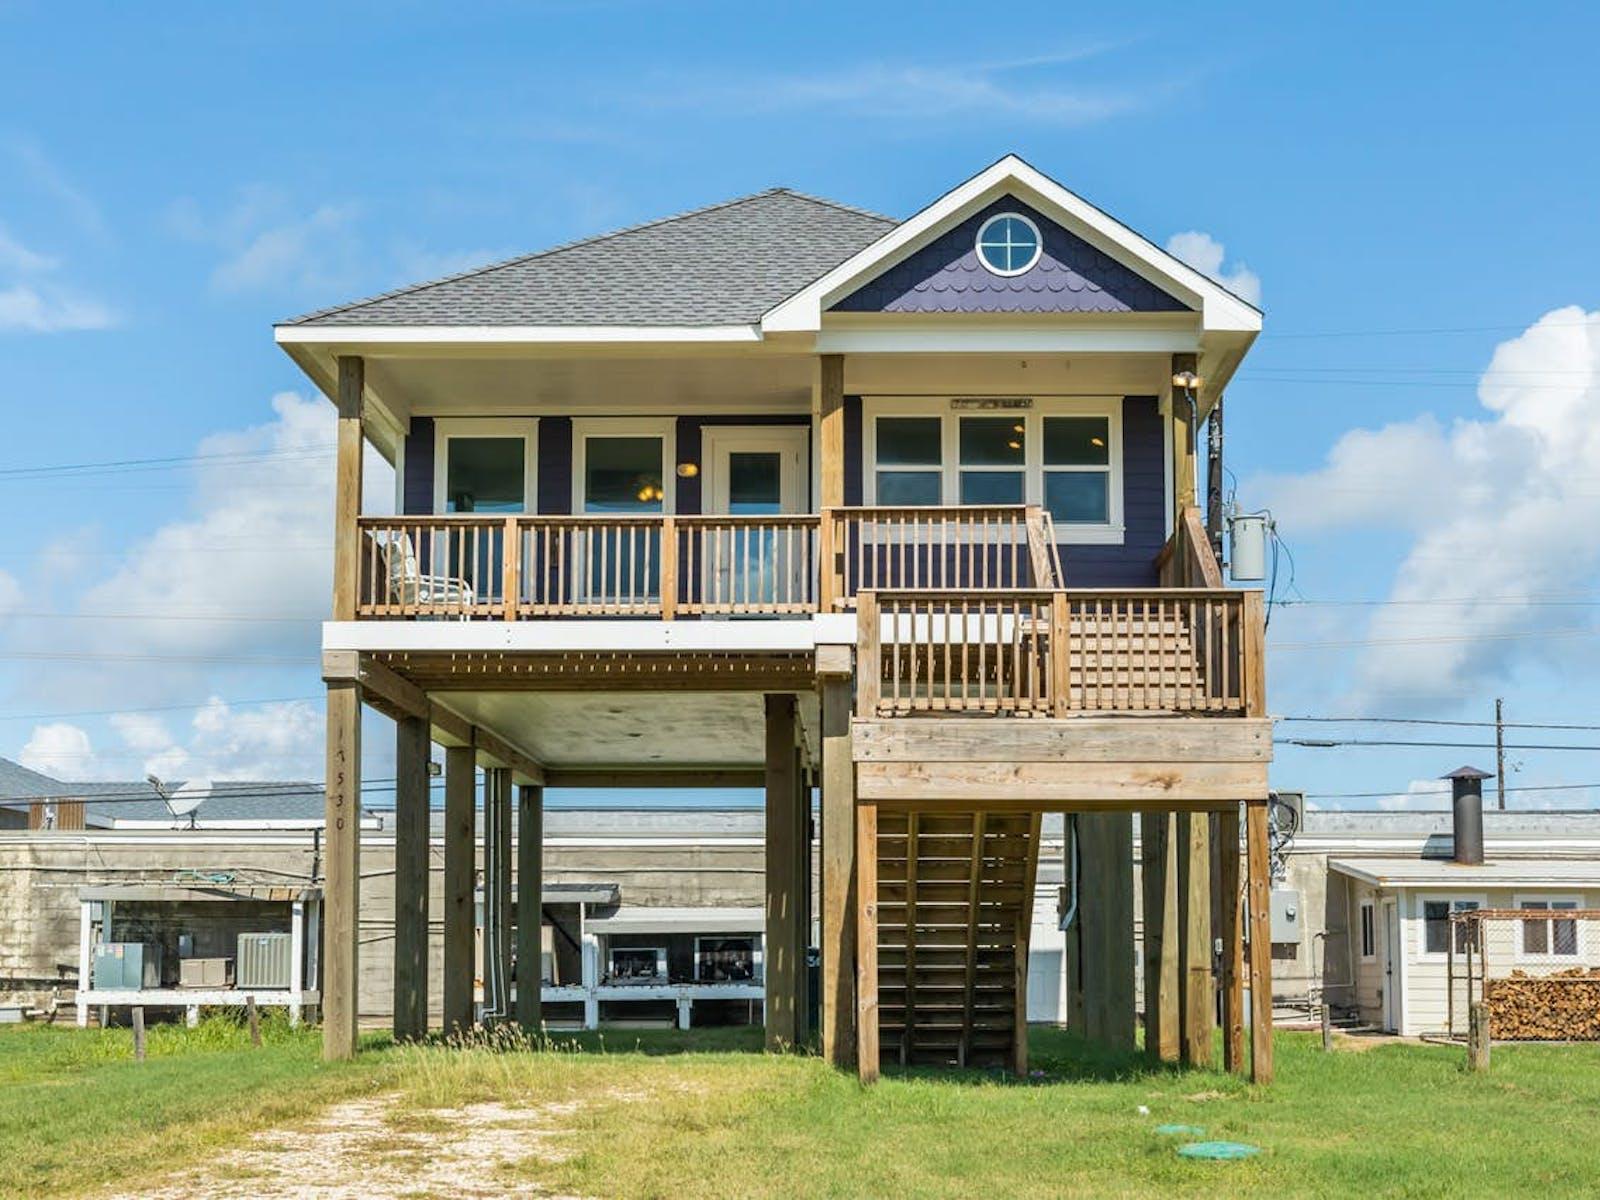 Marvelous Galveston Beach House Rentals In Every Sea Glass Hue Vacasa Home Interior And Landscaping Elinuenasavecom